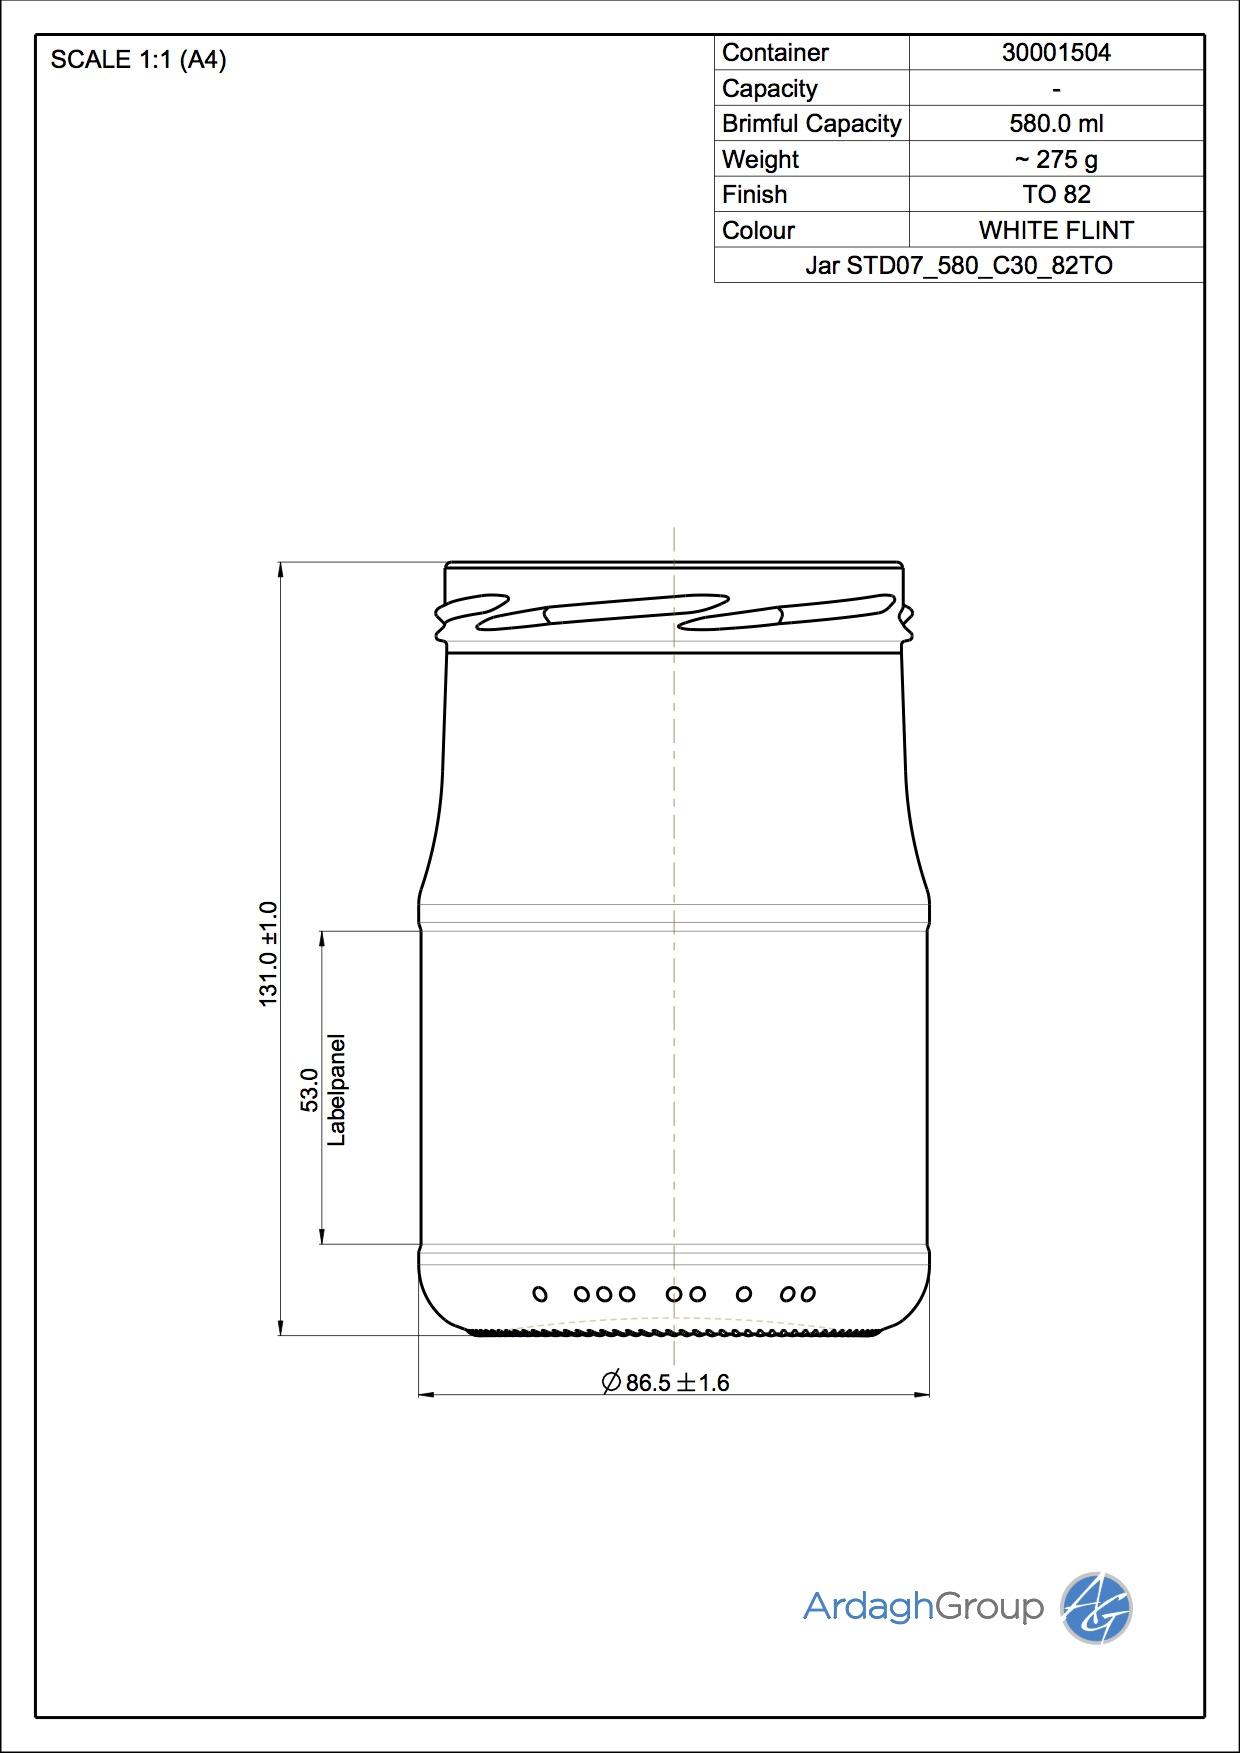 Jar STD07 580 C30 82TO